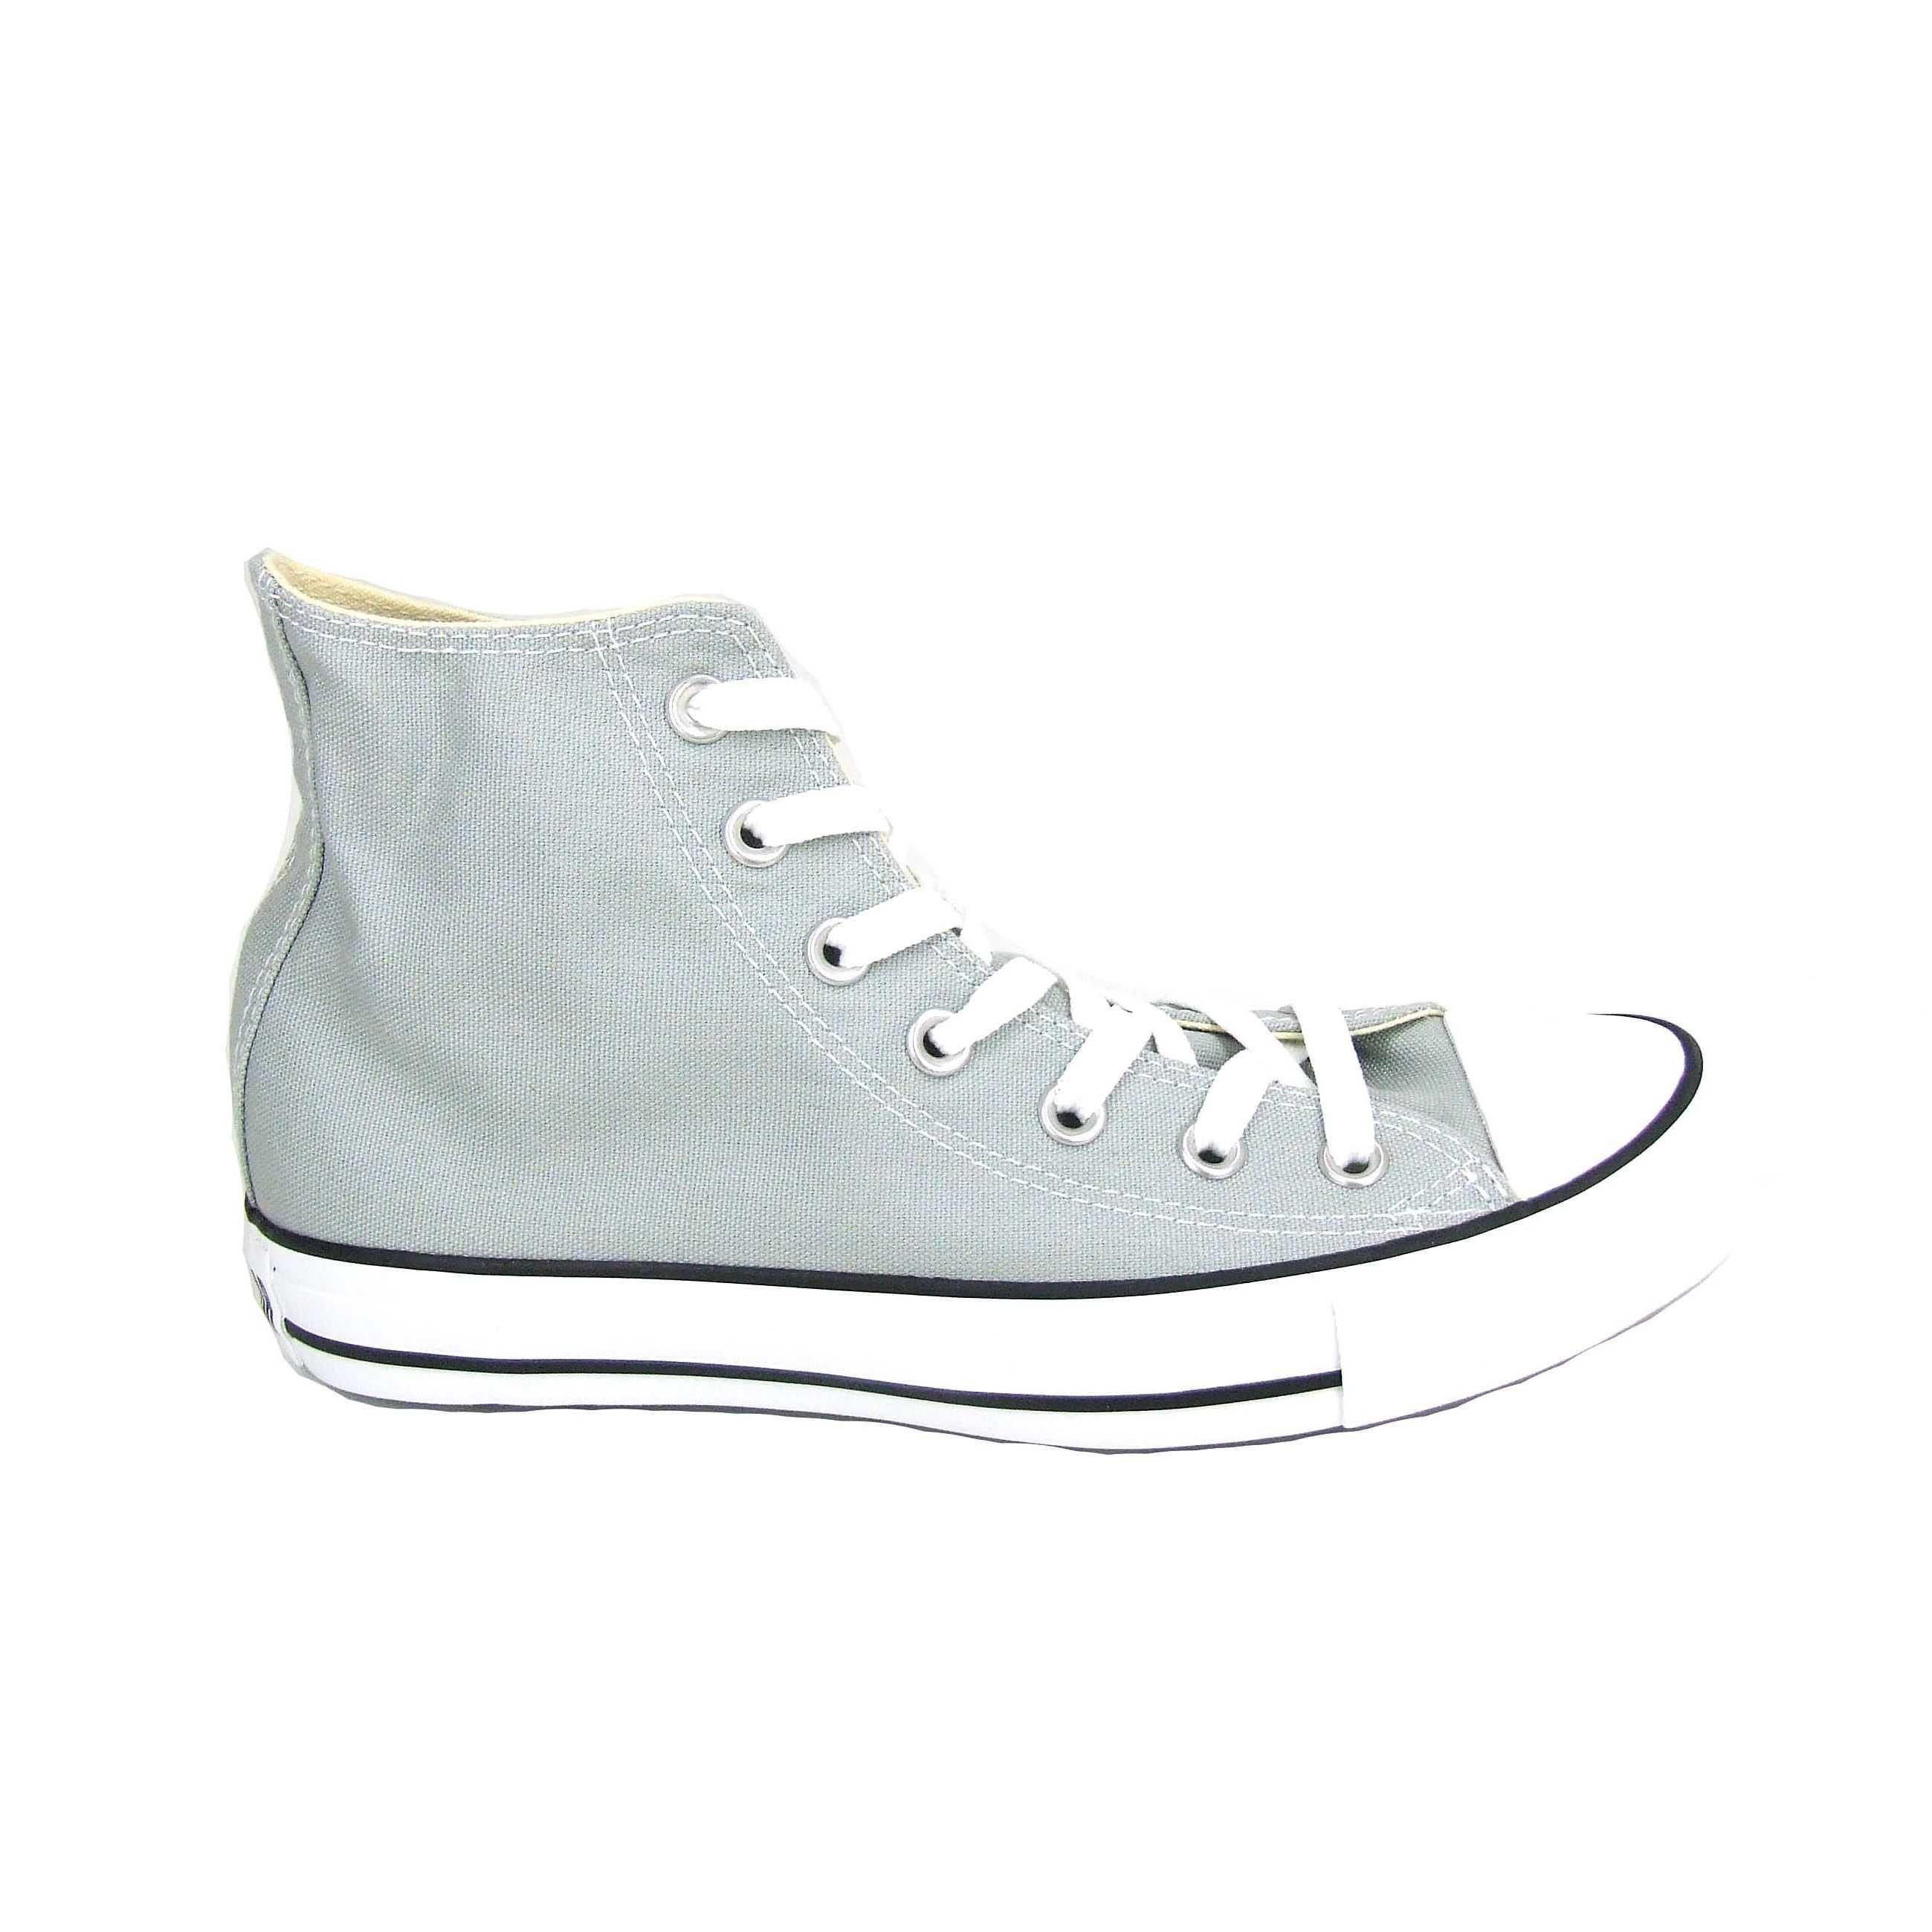 0a837433cc3 De klassieke enkelhoge sneaker van het merk All Stars / Converse.  Uitgevoerd in canvas met